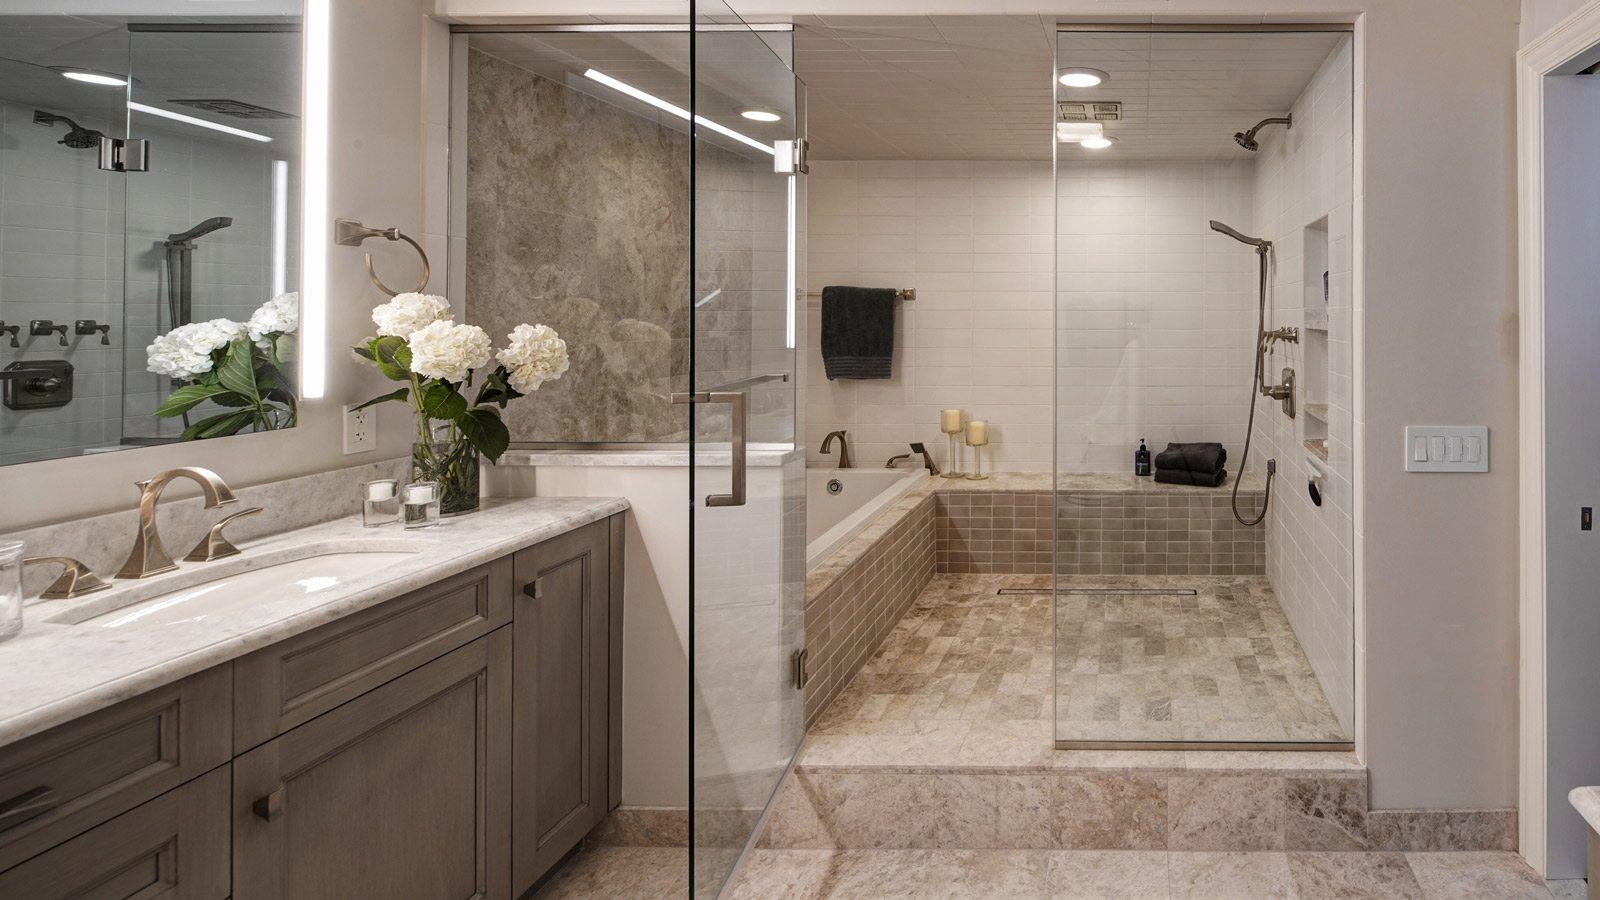 Chicago Condo Master Bath Renovation - Drury Design on Master Bath Remodel Ideas  id=50596